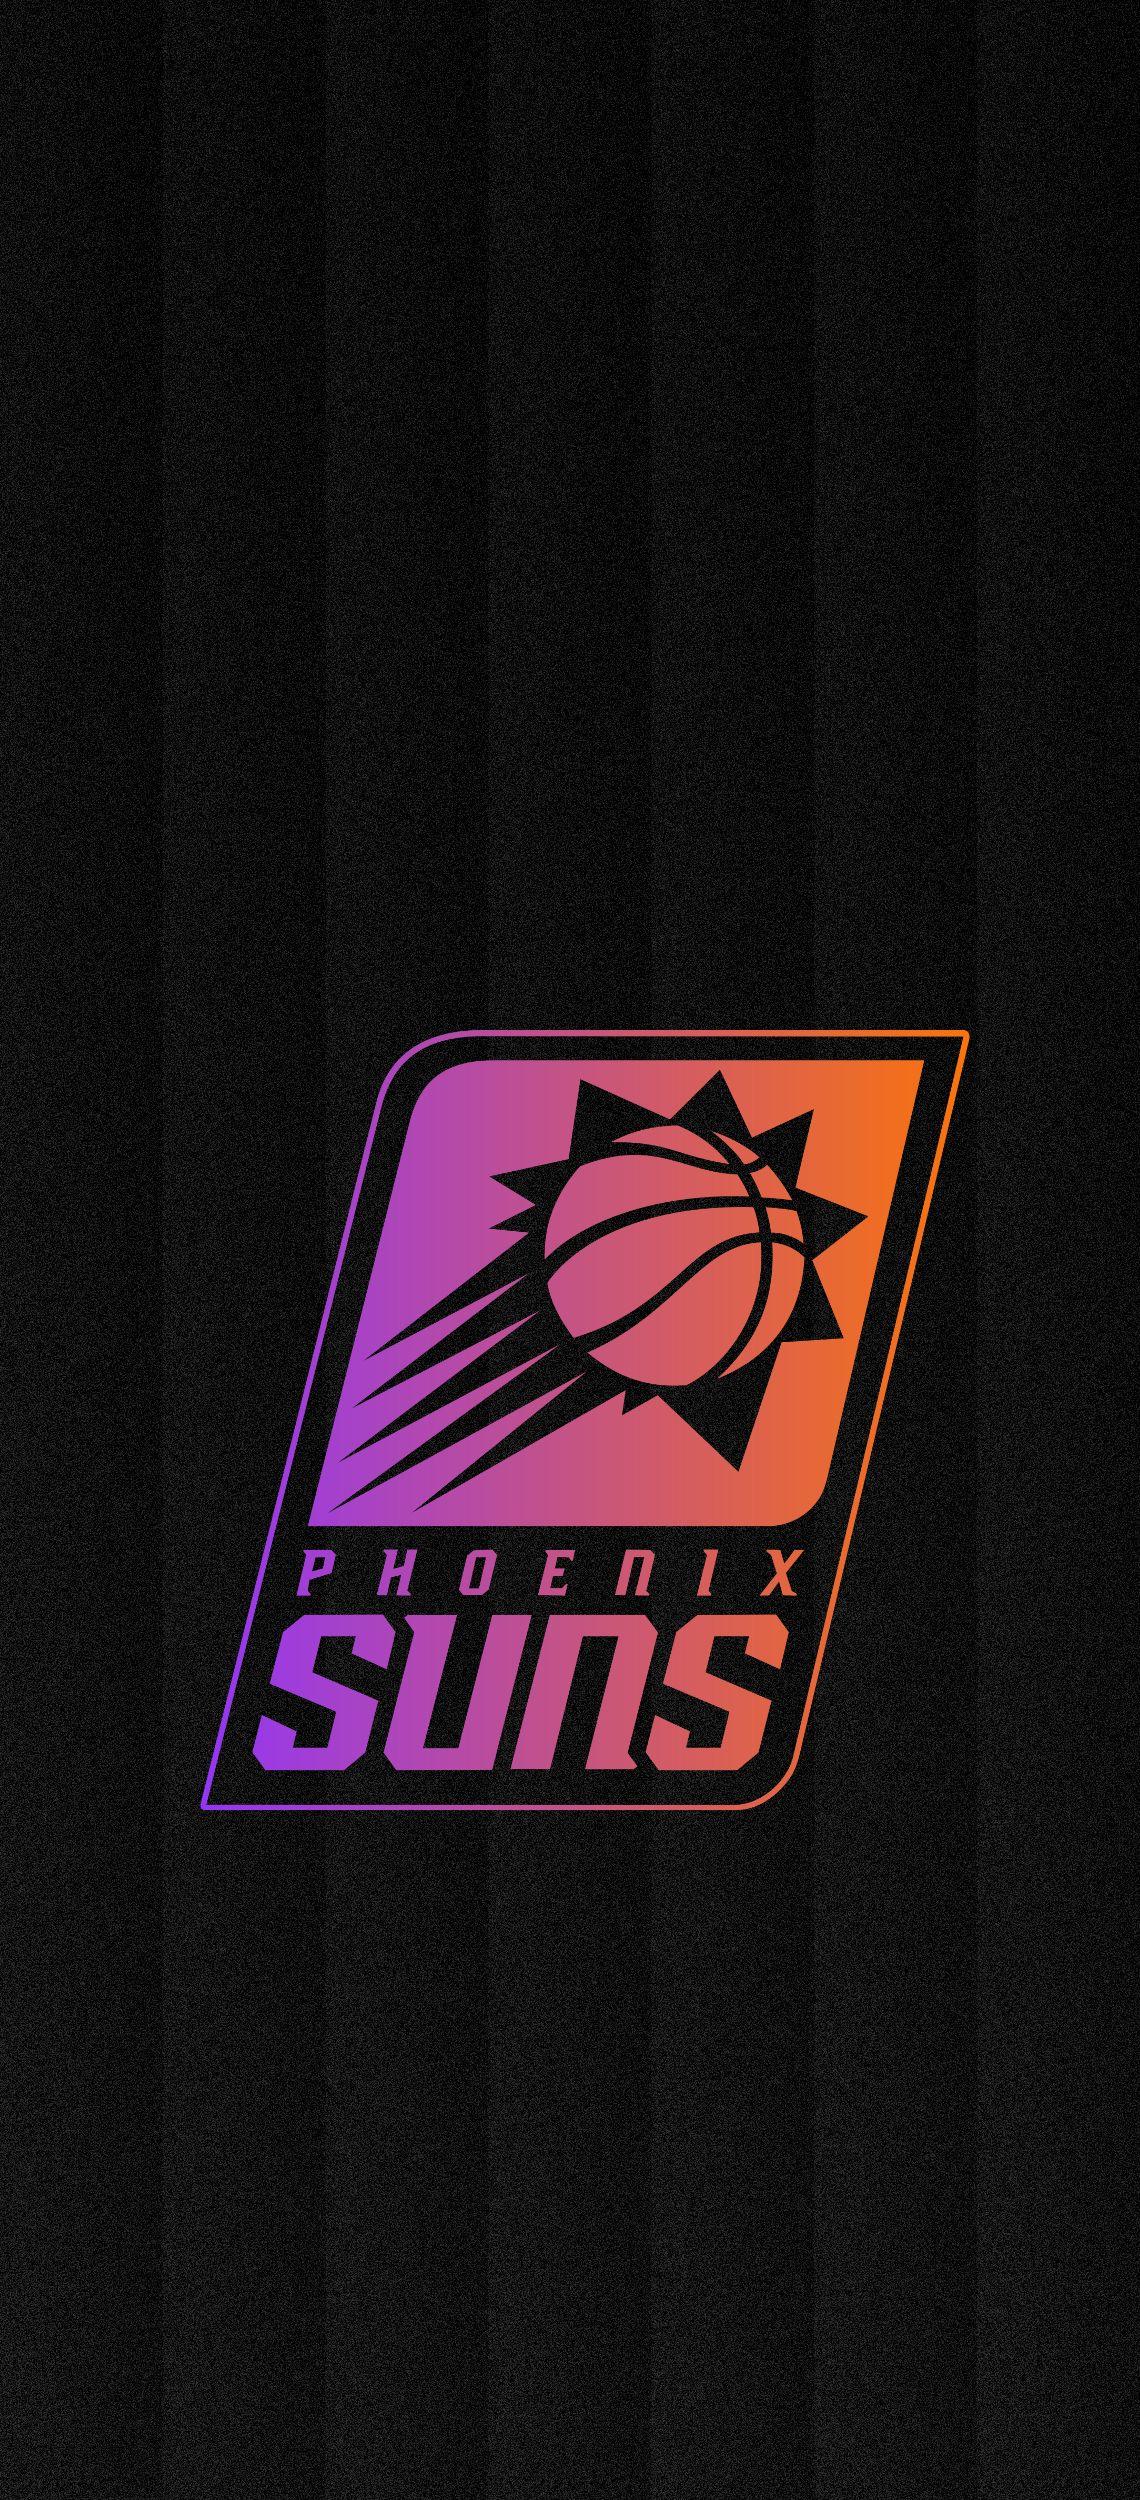 Phoenix Suns Gradient Wallpaper Phoenix suns basketball Phoenix 1140x2500